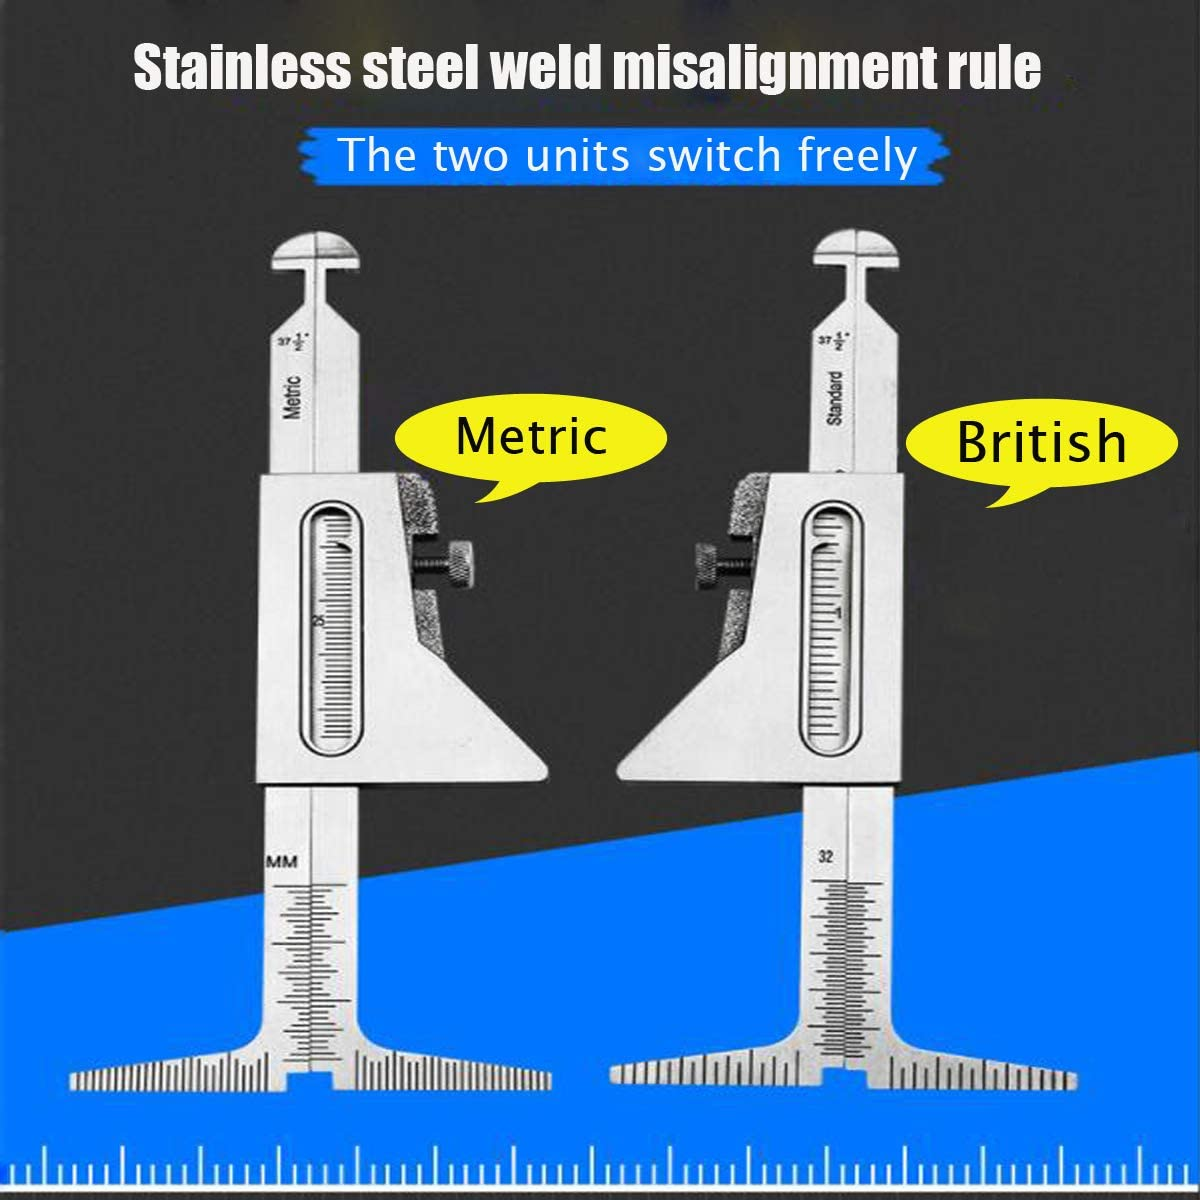 JJDD Metric Welding Taper Gauge Gage Set Test Welding Taper Gap Gauge Depth Ruler Stainless Steel Set with Hi Lo Welding Gauge Gage Test Ulnar Welder Inspection Gauge Tool kit for Welding Measurement